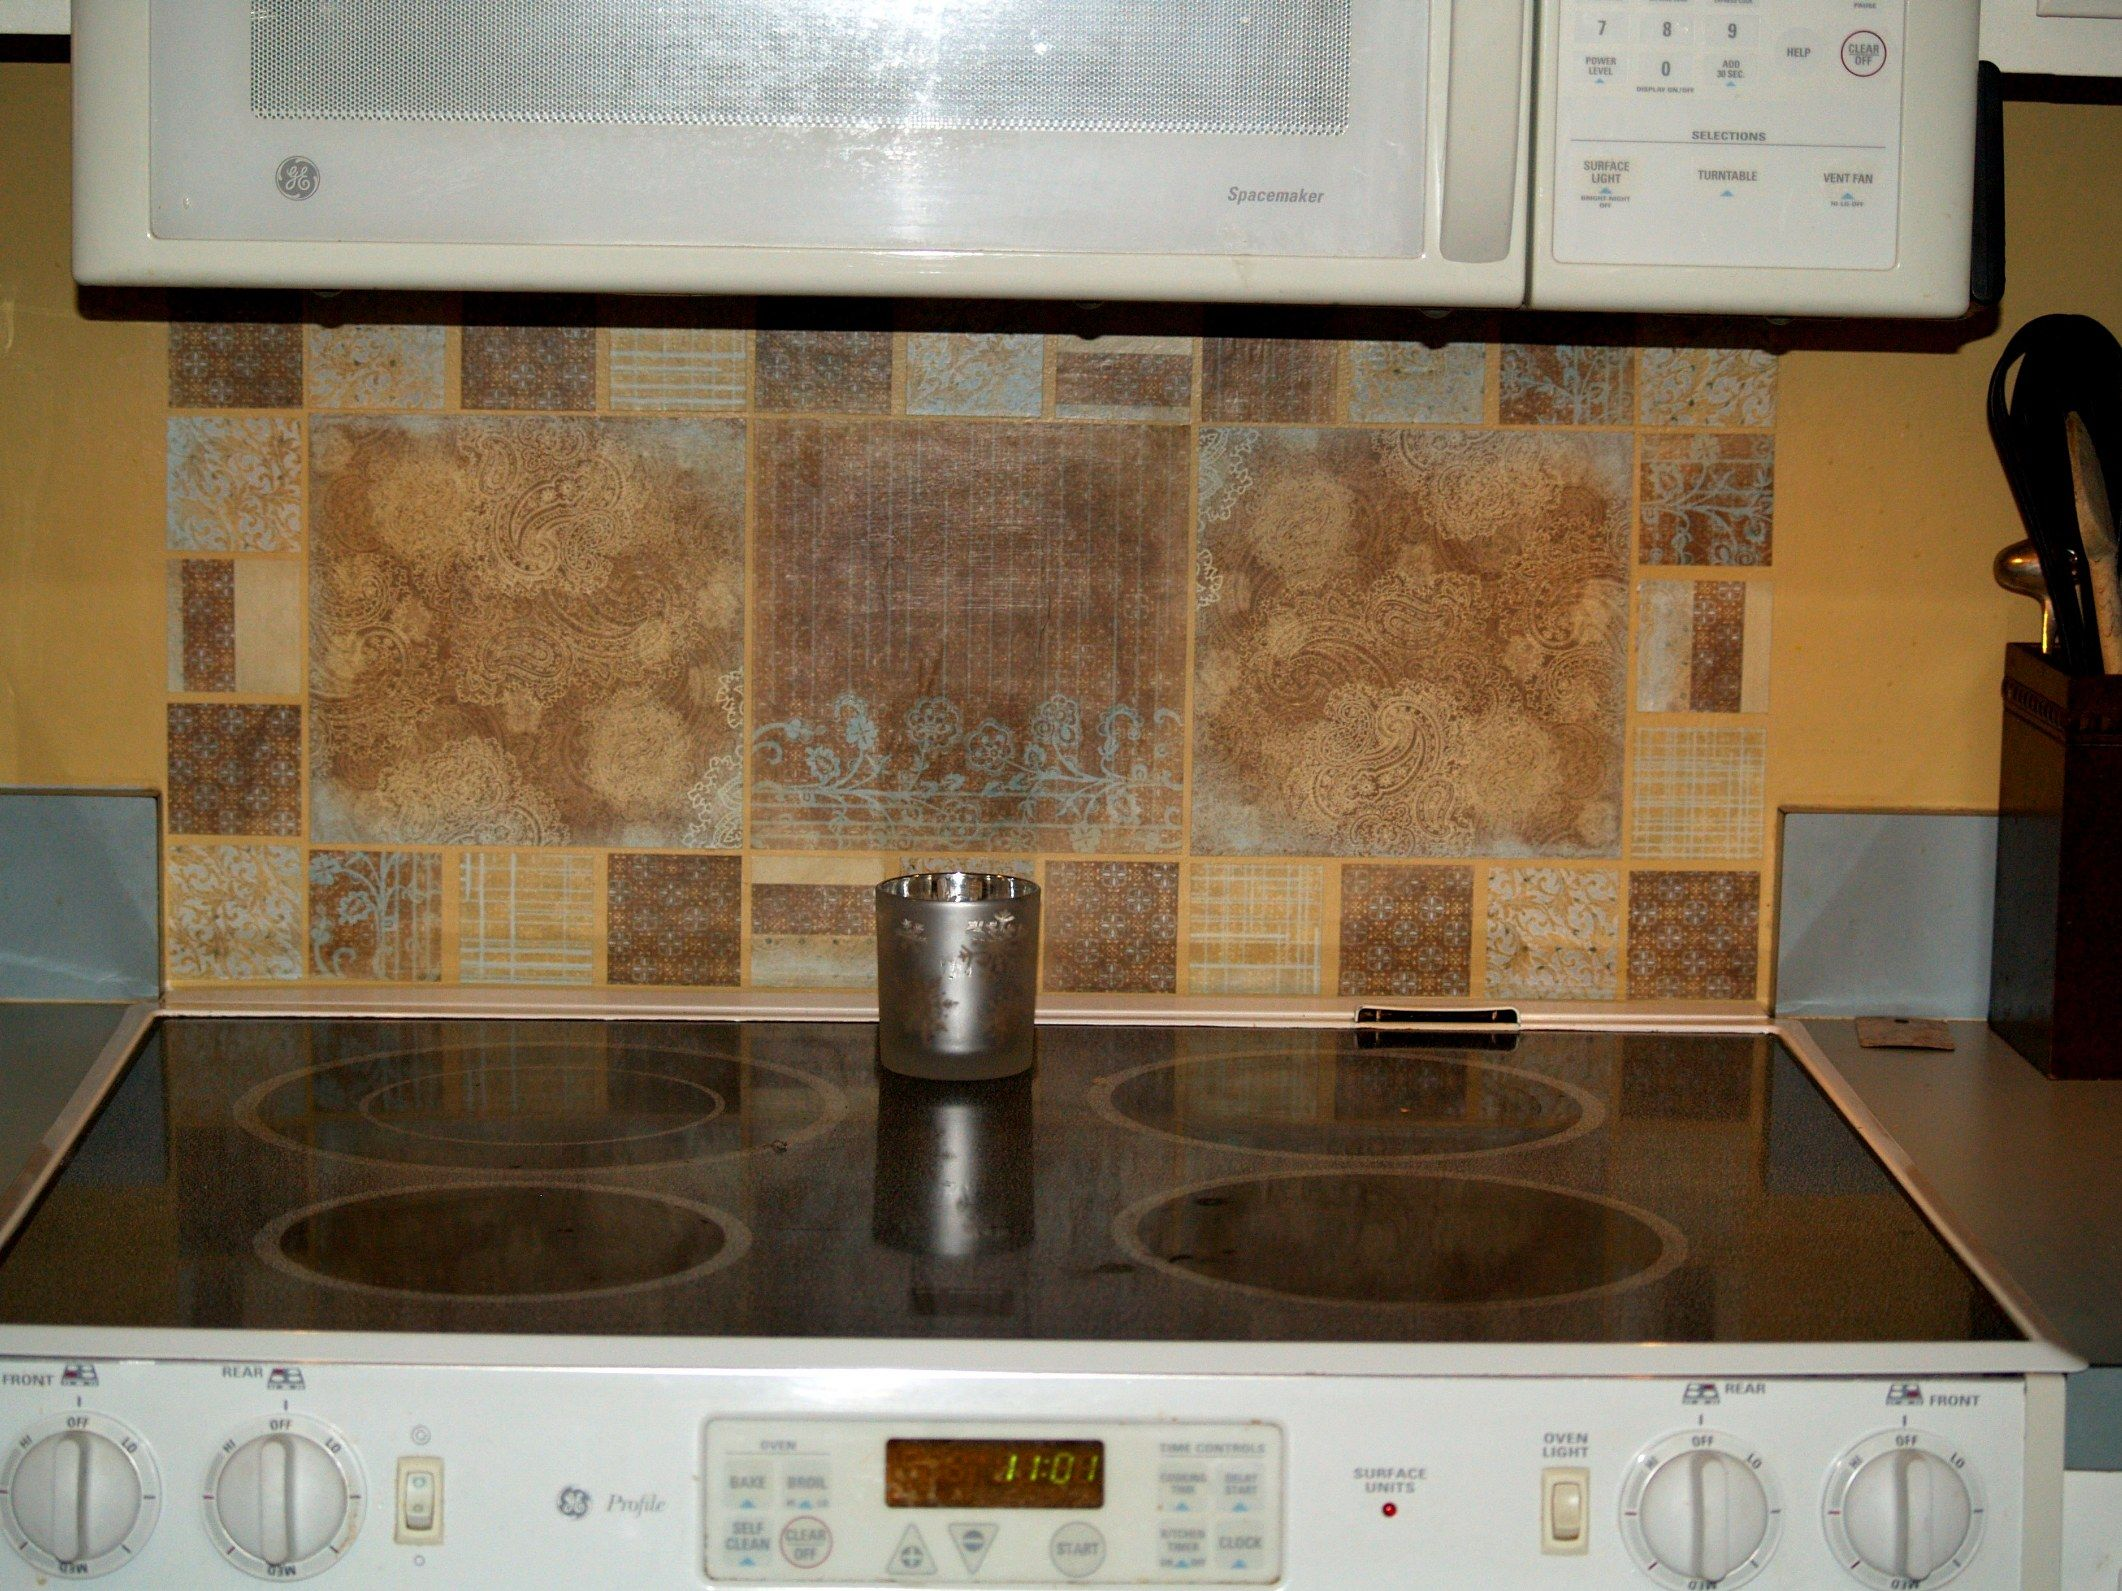 Faux Tile Back Splash Using Sbook Paper And Mod Podge My Own Creation